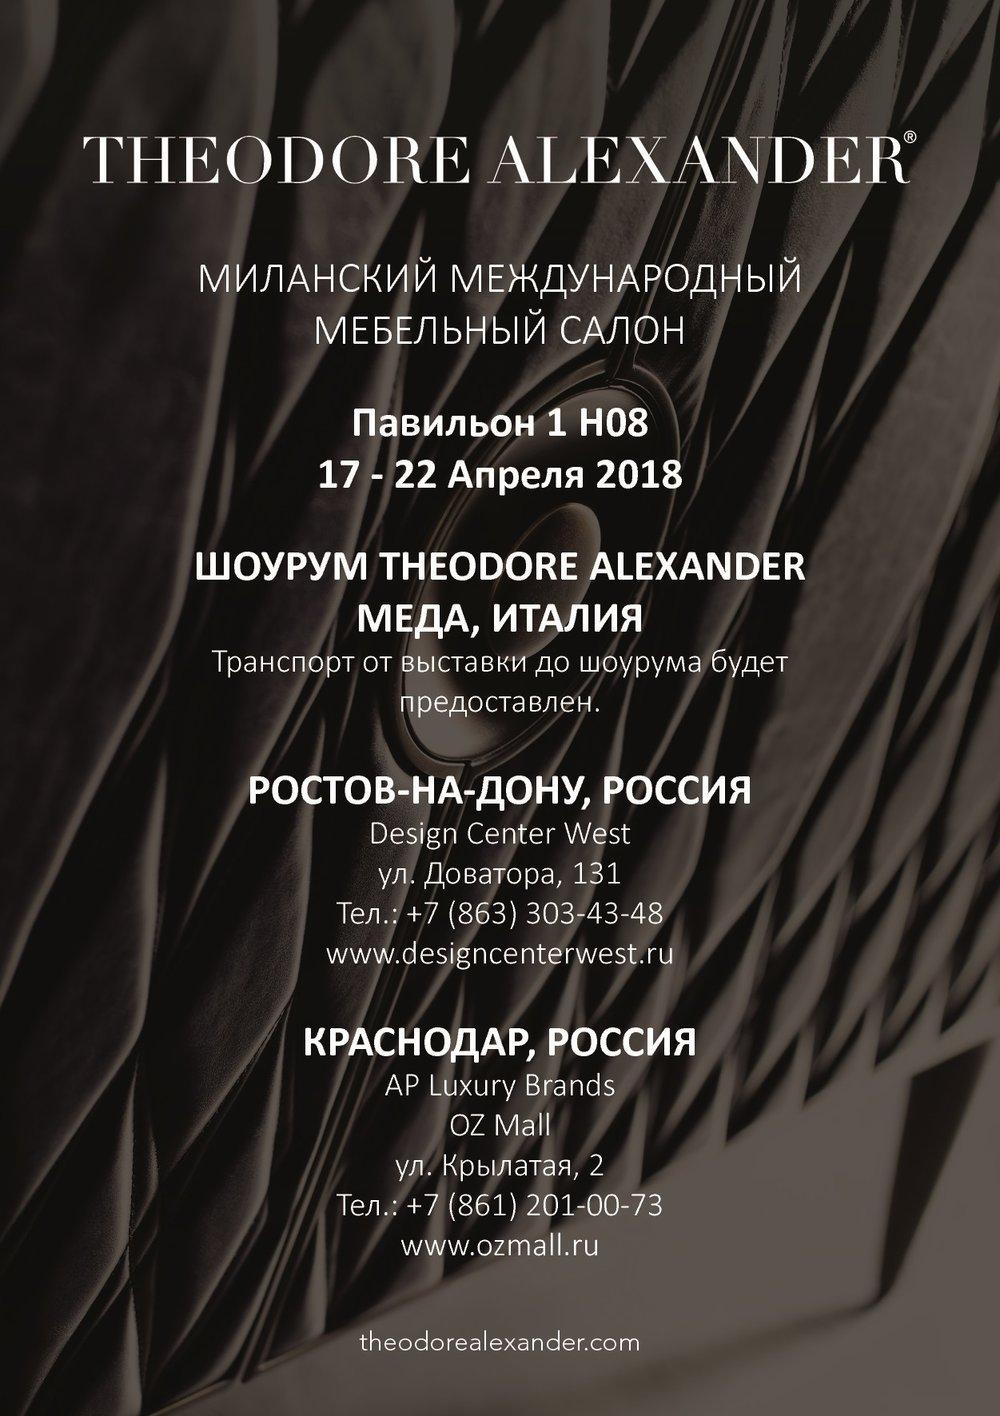 Milan Postcard_ready to print_Rostov Krasnodar (pdf.io).jpg